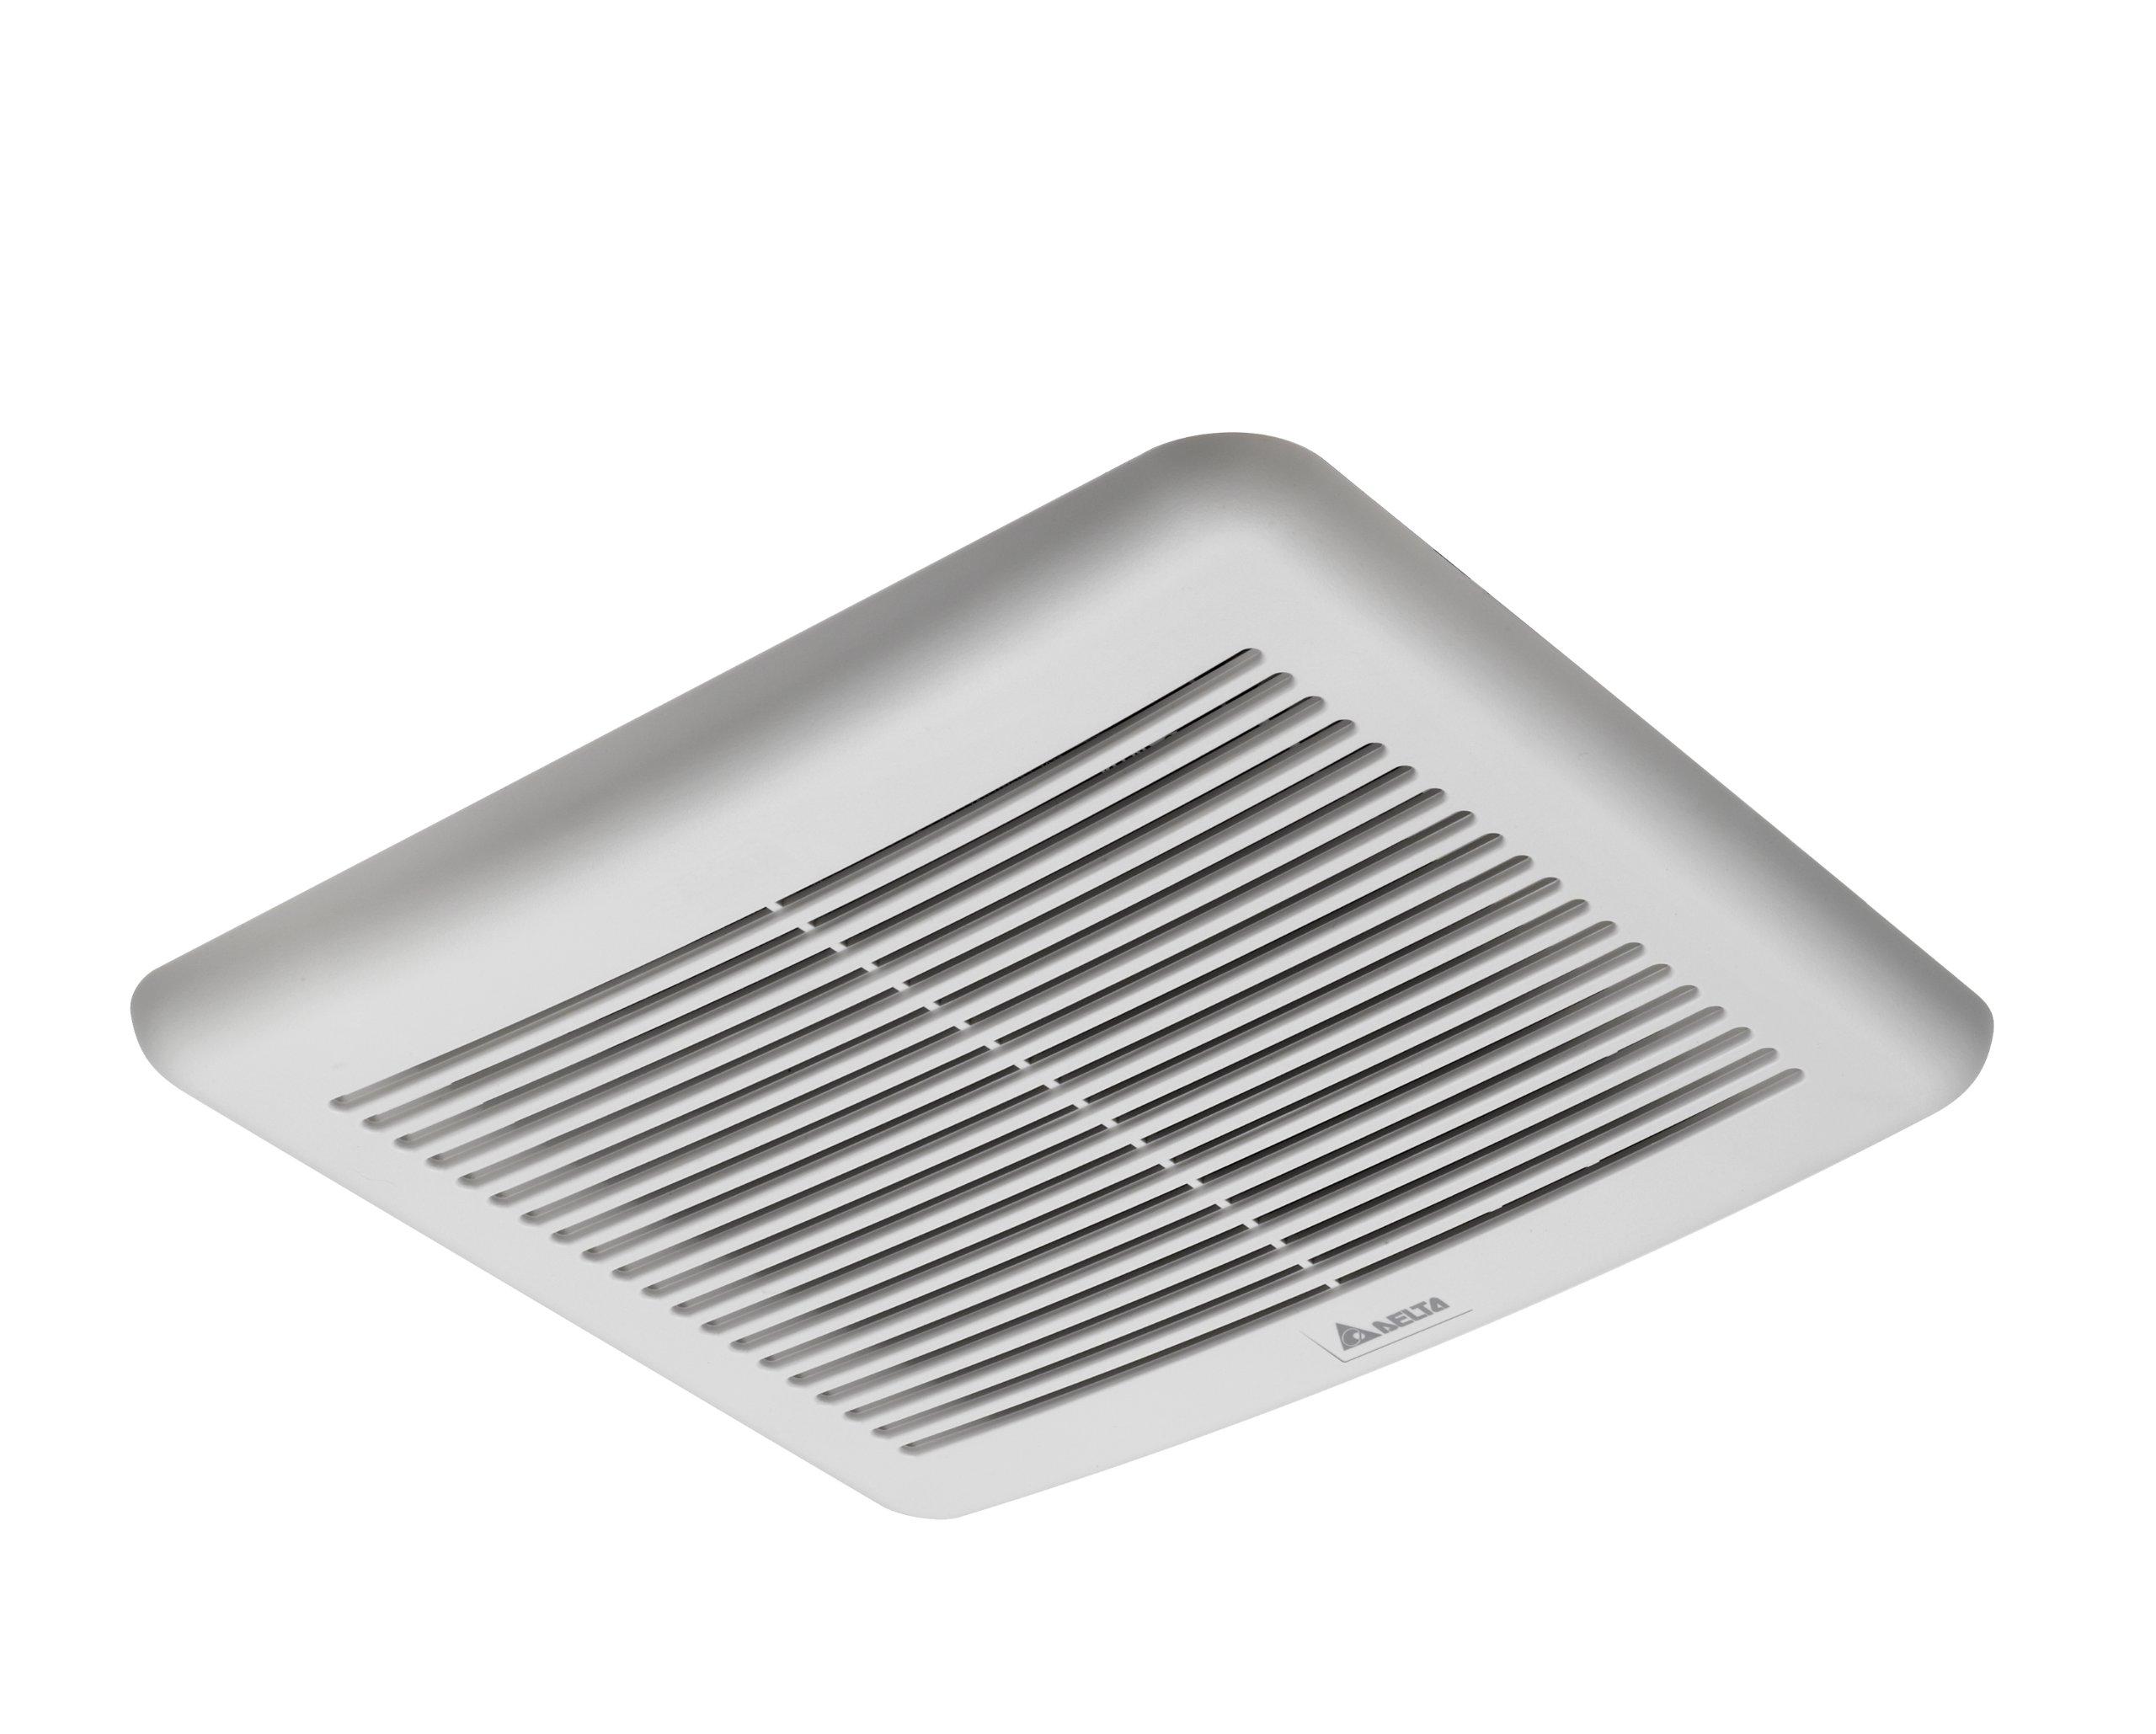 Delta BreezSlim VFB050B3A1 50 CFM Exhaust Bath Fan, White, 1 Sone by Delta Electronics (Image #1)